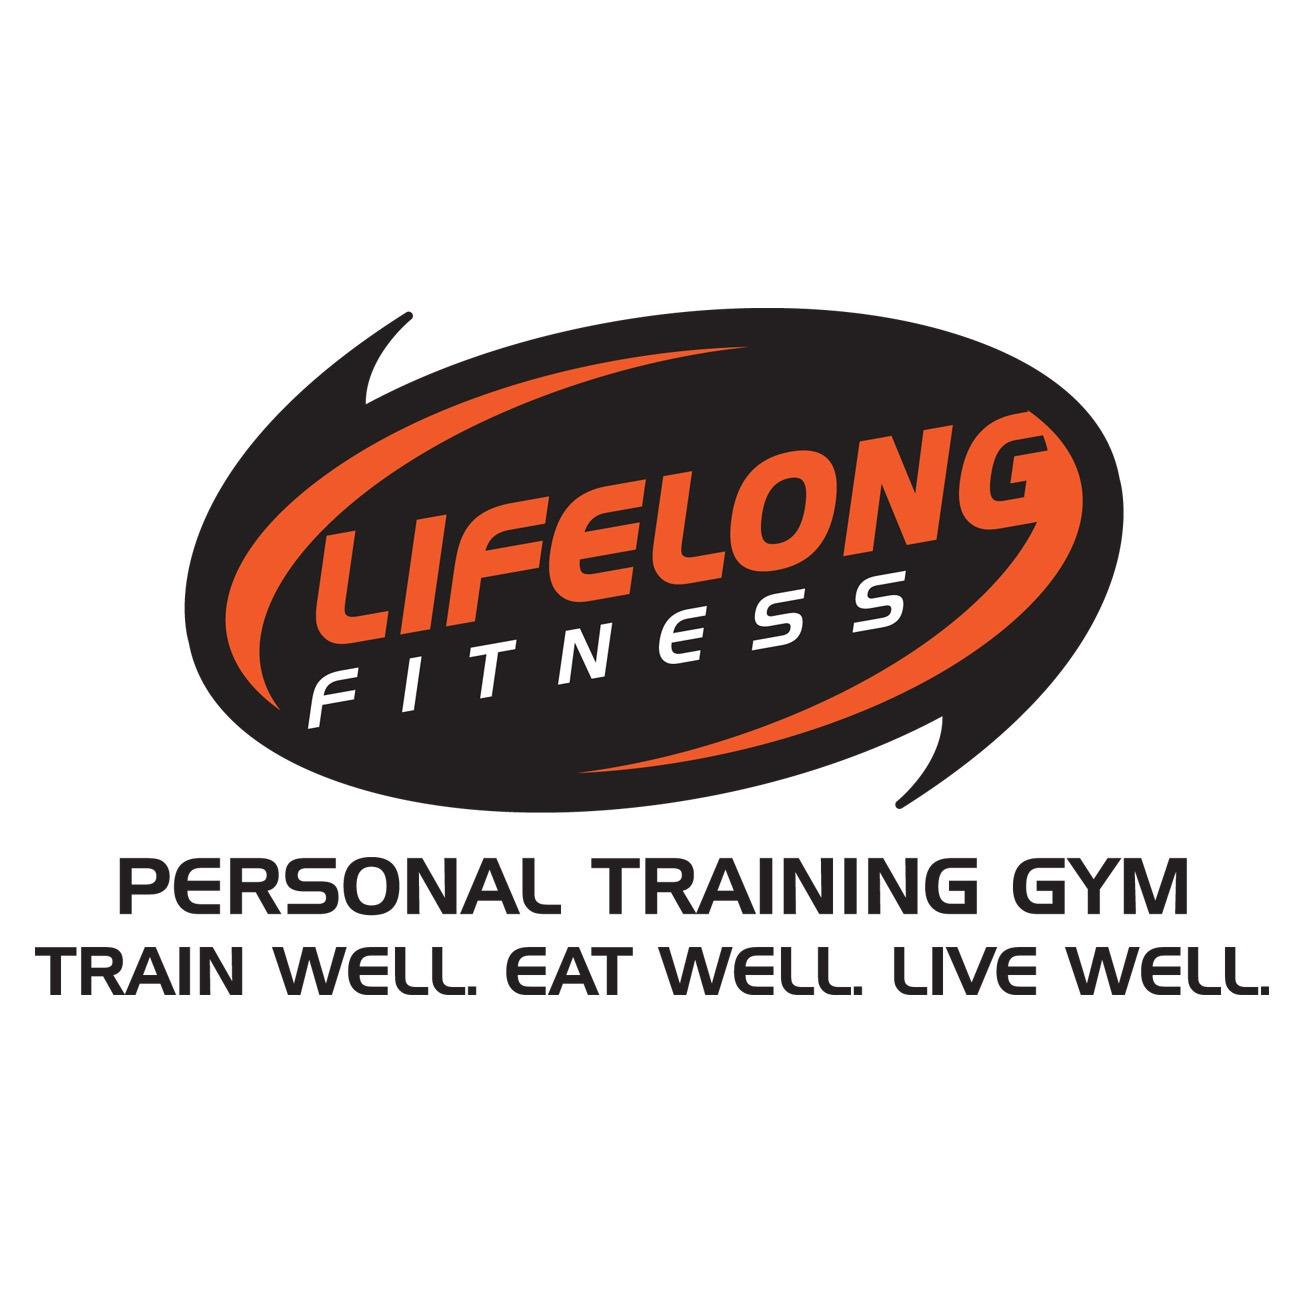 Lifelong Fitness Personal Training Gym